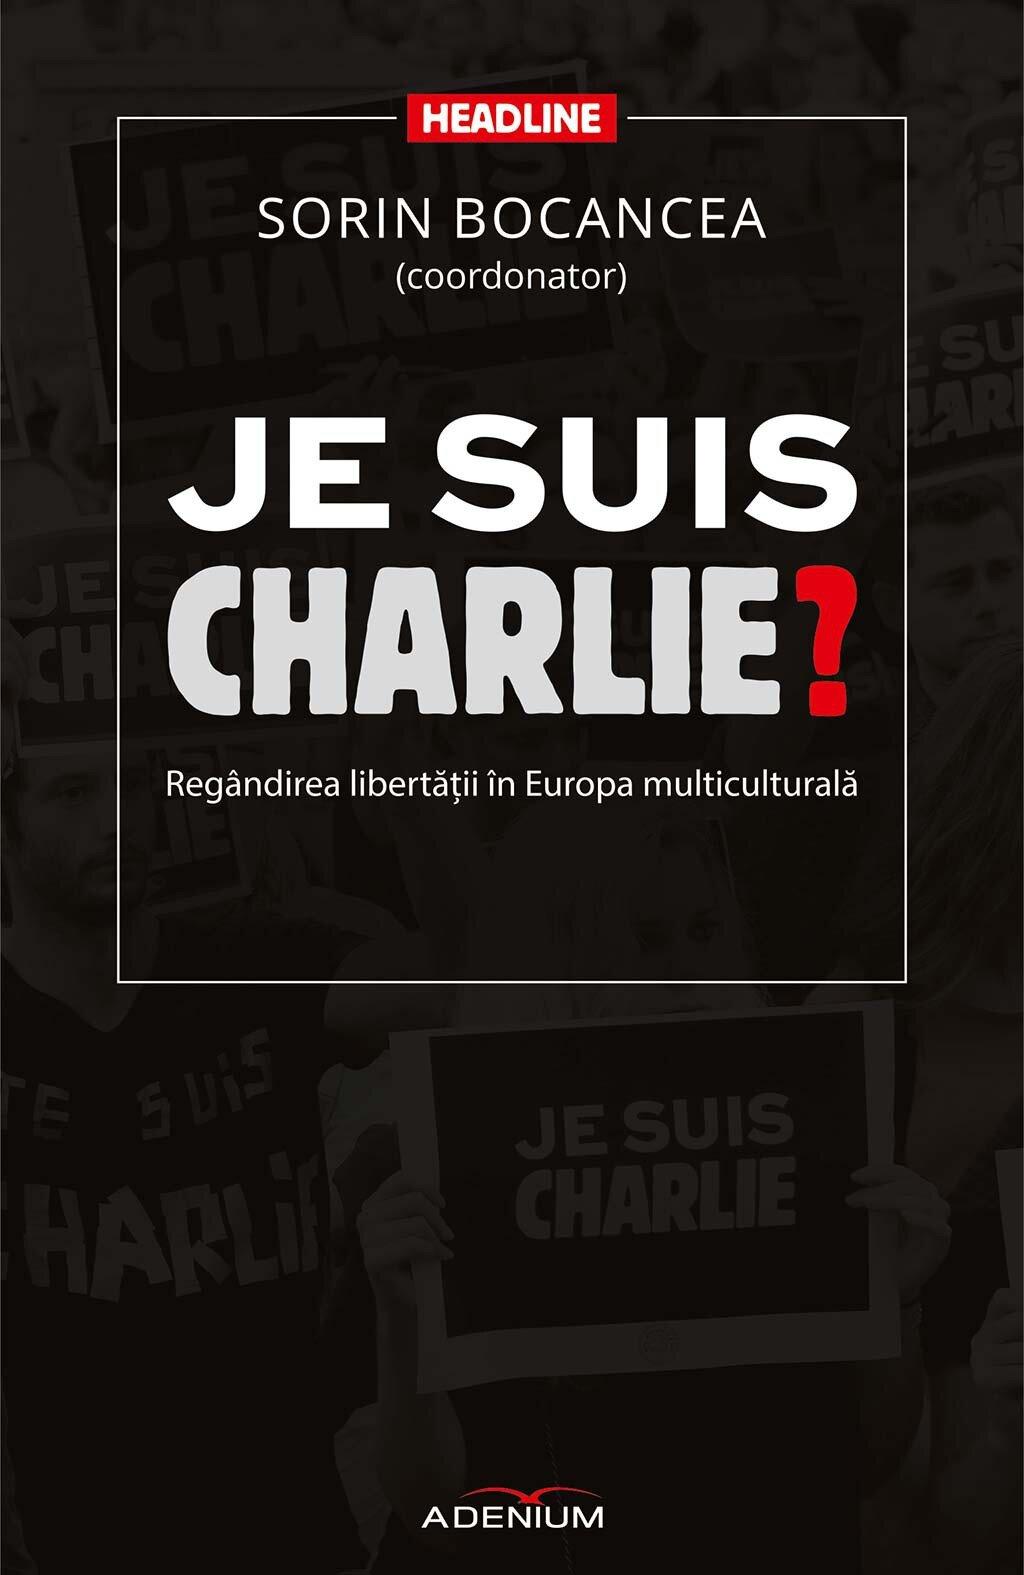 Je suis Charlie? Regandirea libertatii in Europa multiculturala PDF (Download eBook)